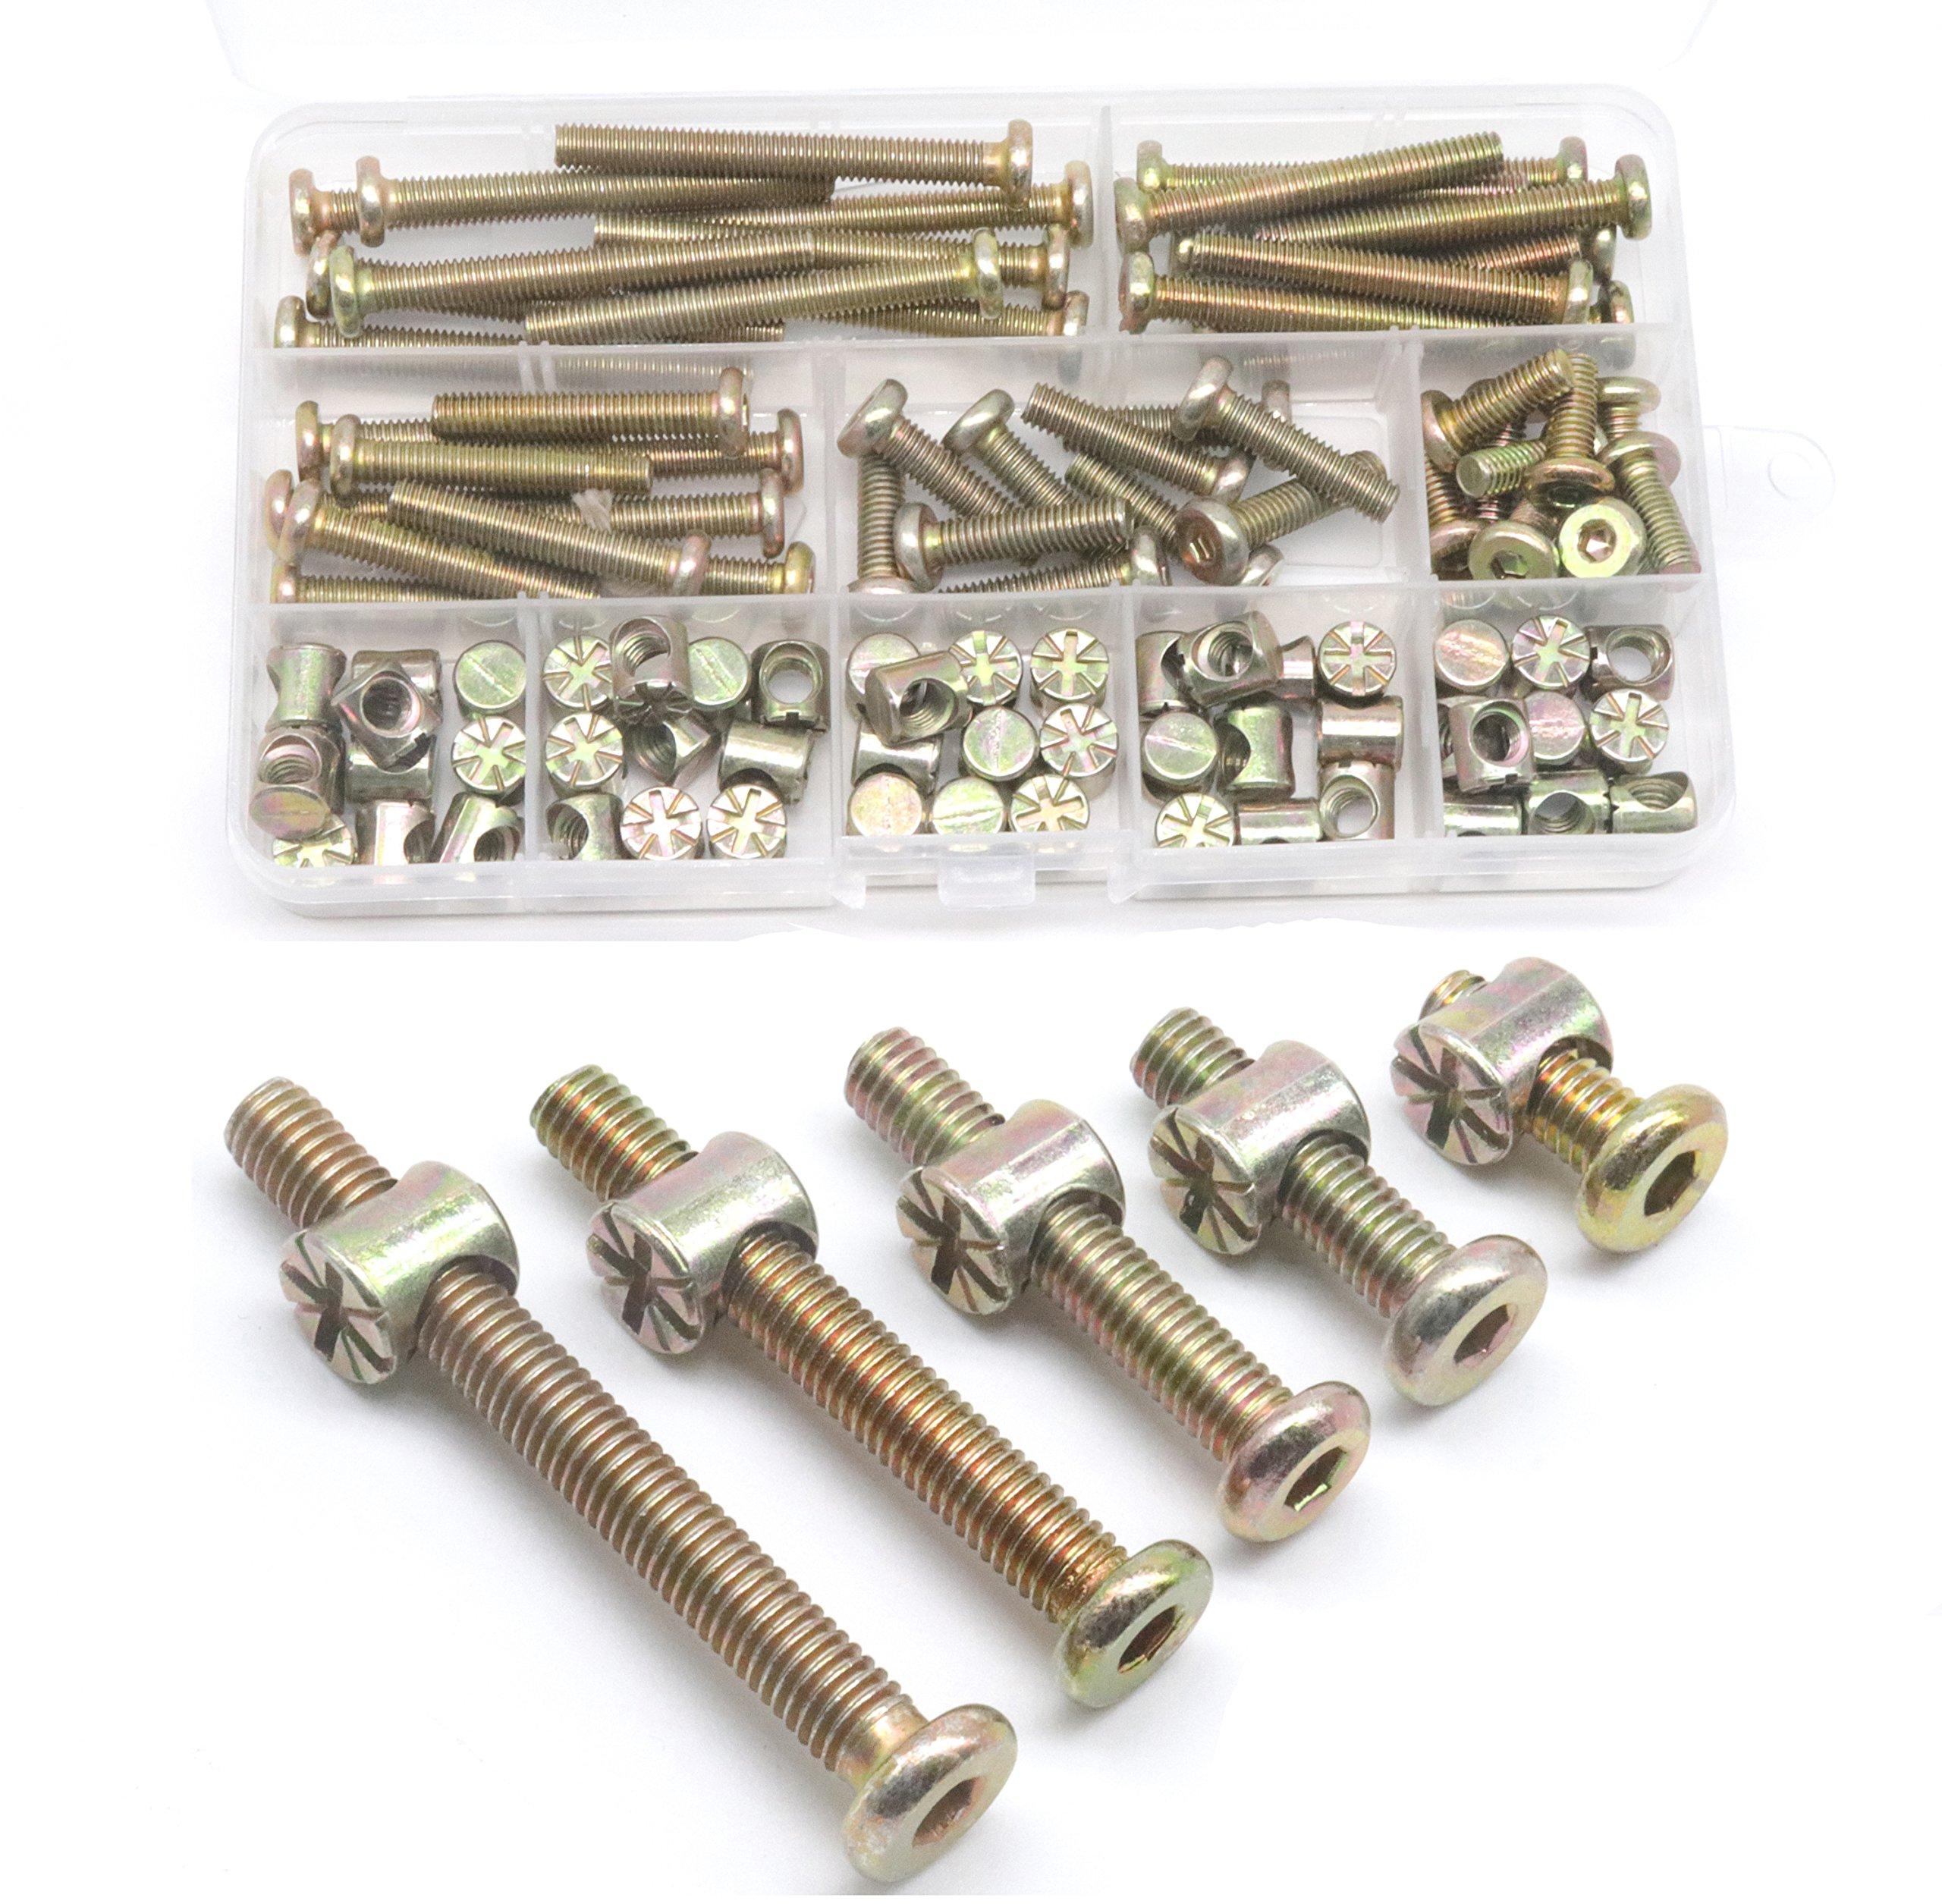 Baby Bed Screws Bolts Kit, cSeao M6 Hex Drive Socket Cap Bolts Barrel Nuts Assortment Kit, M6 x 15mm/25mm/35mm/45mm/55mm for Crib Cot Chairs, 100pcs Zinc Plated